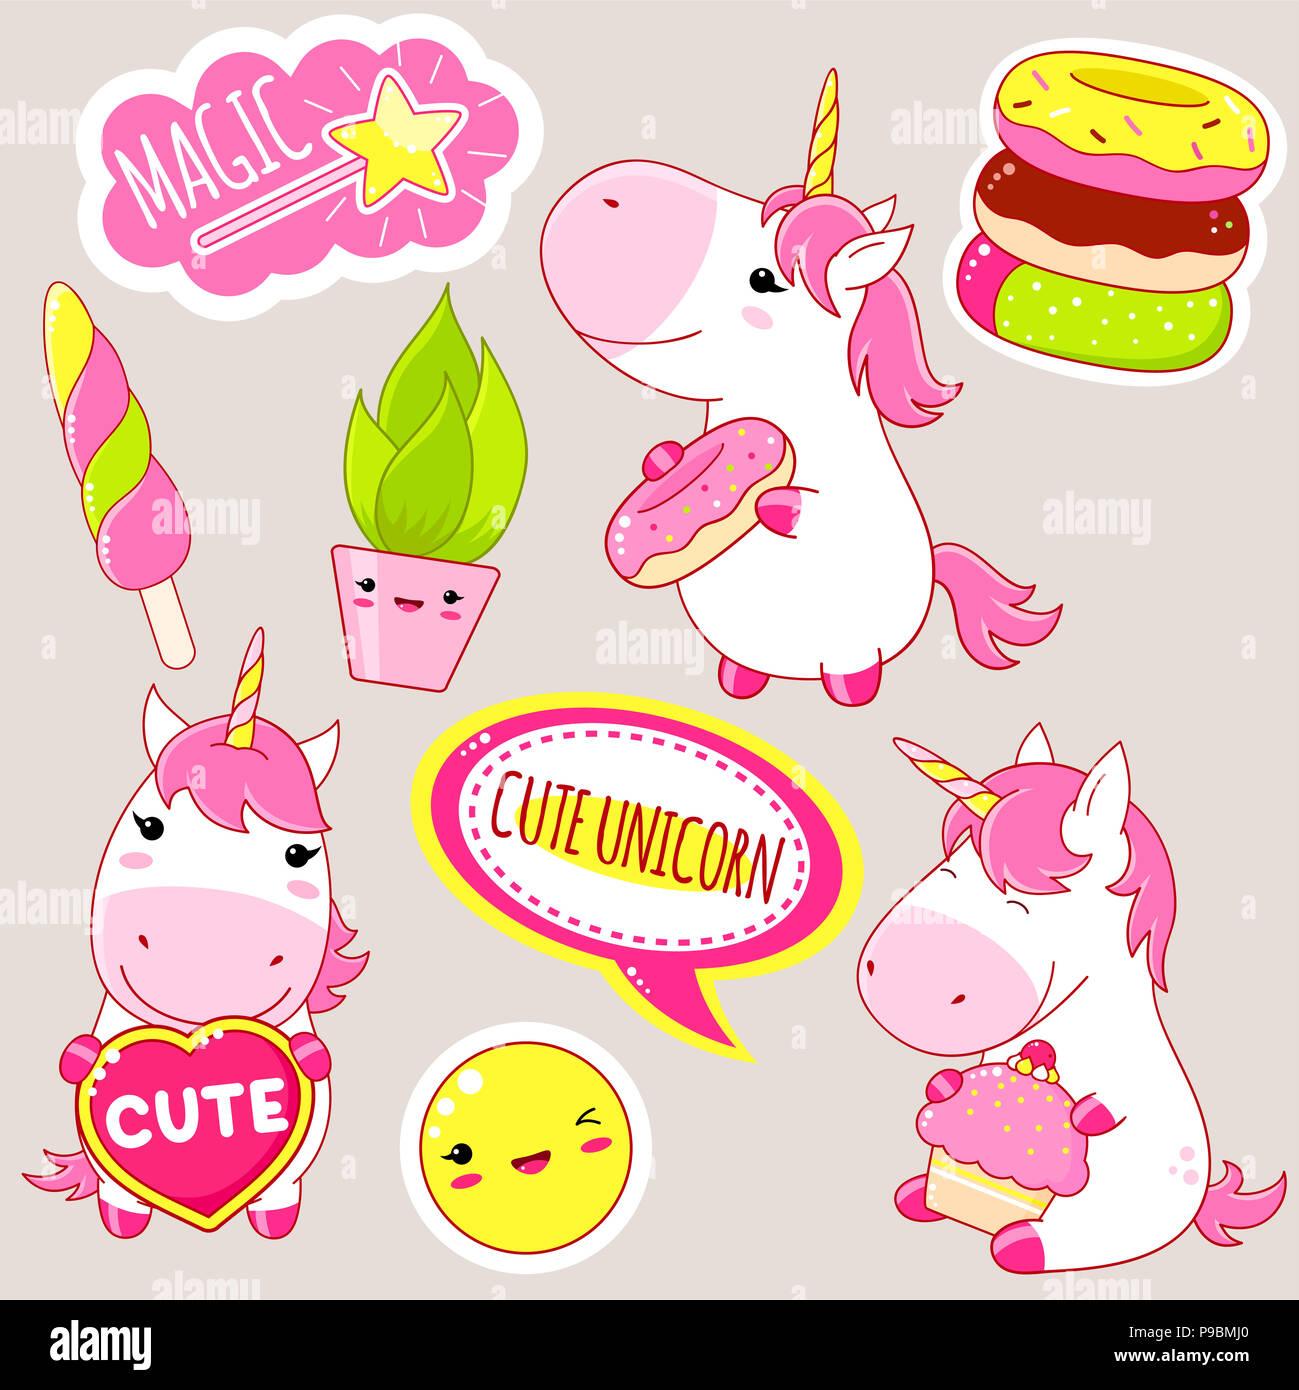 Unicorn Unicorns Magic Immagini Unicorn Unicorns Magic Fotos Stock